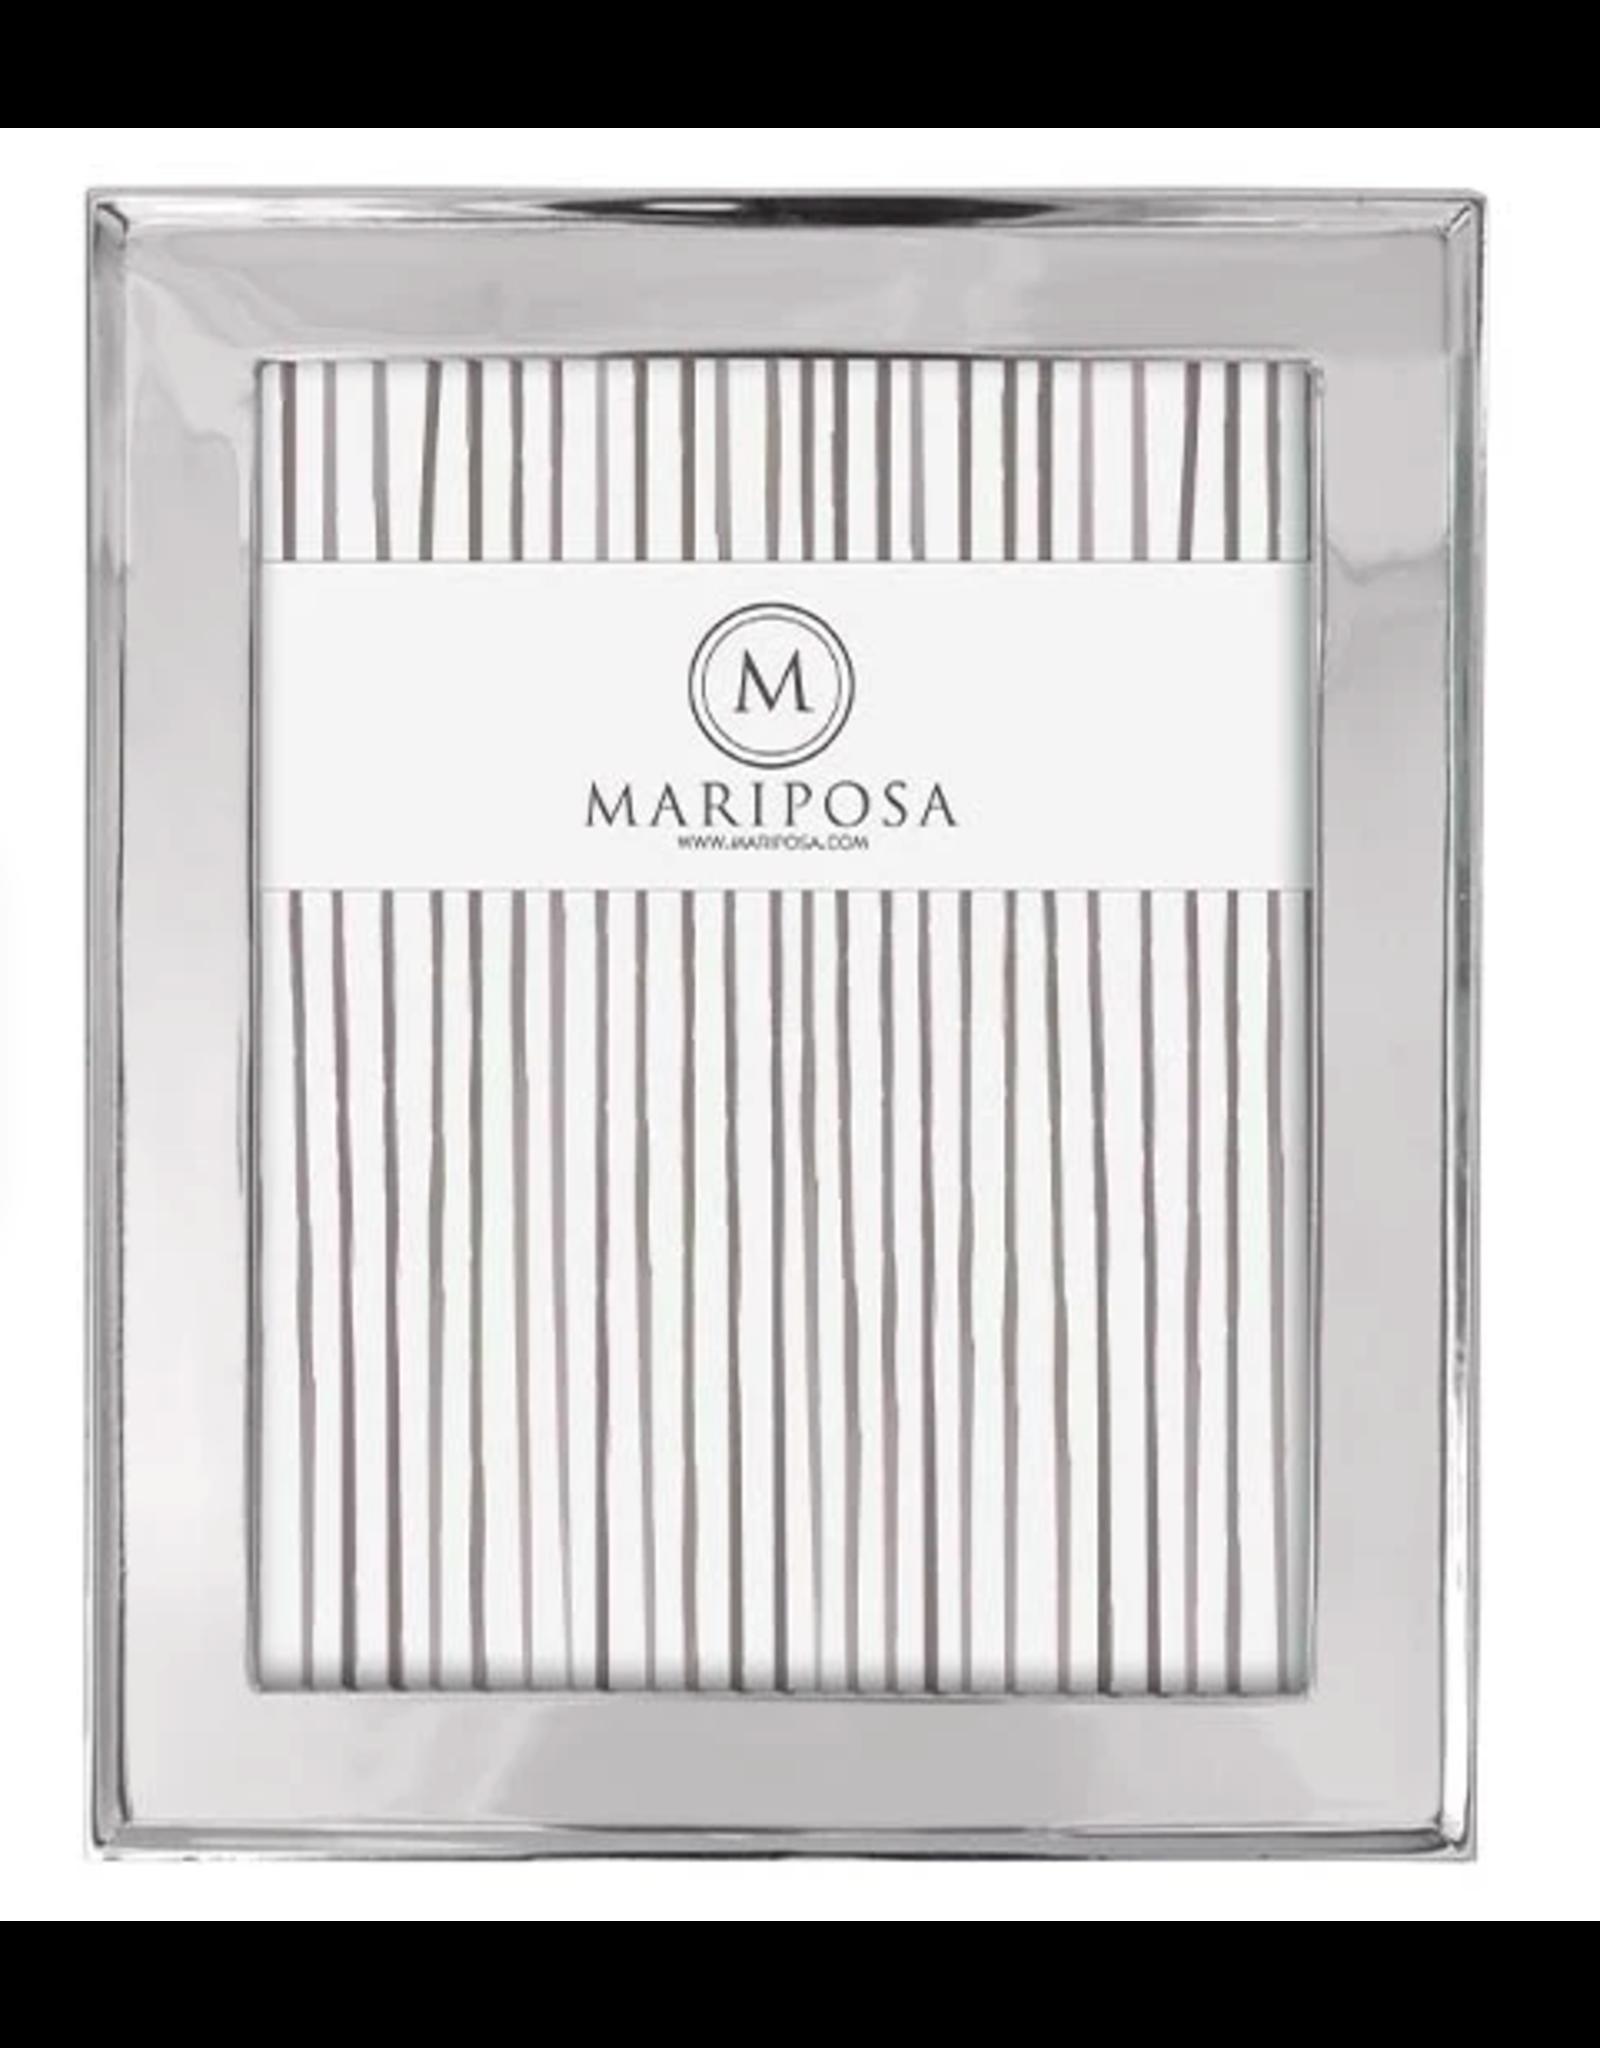 Mariposa Signature 8x10 Frame